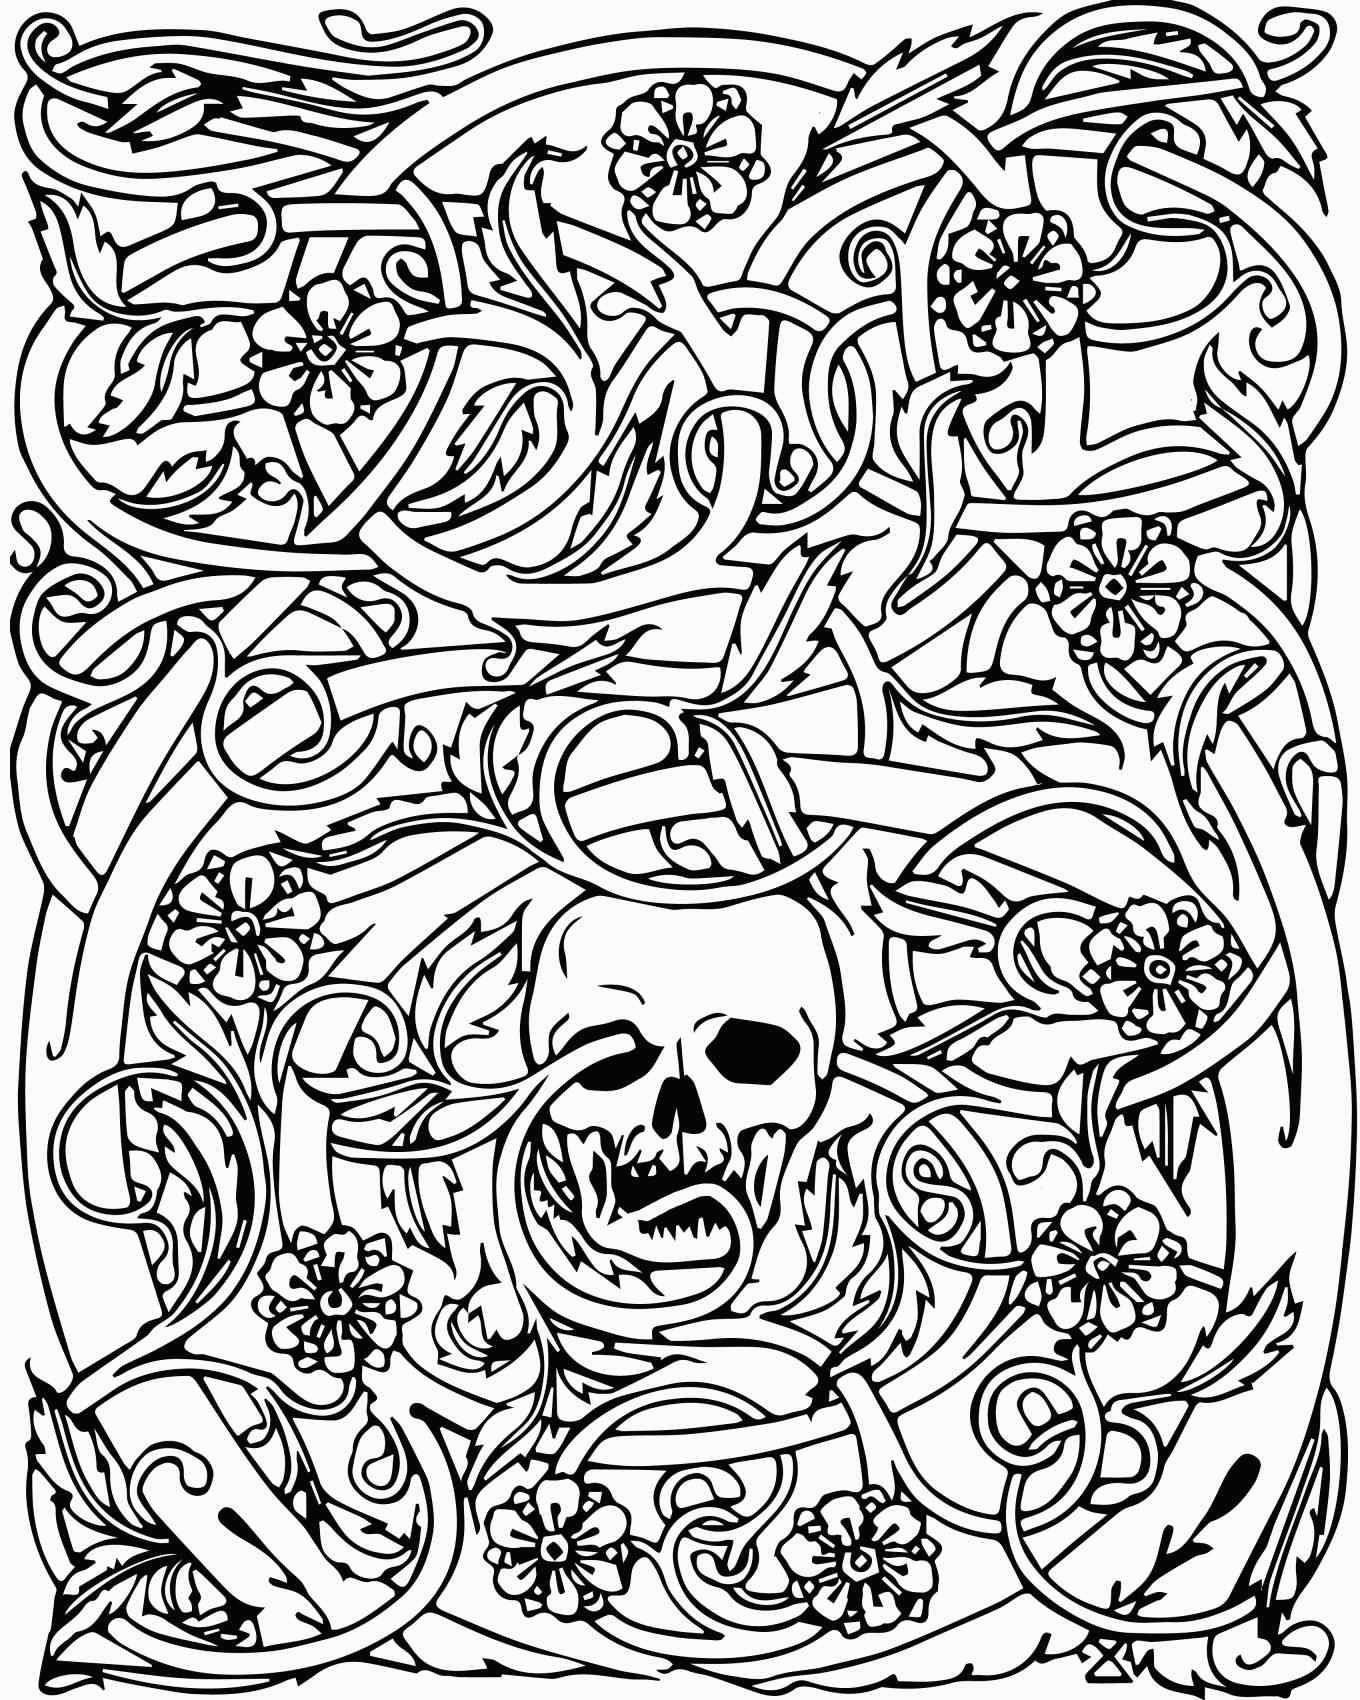 coloring pages skull print download sugar skull coloring pages to have skull coloring pages